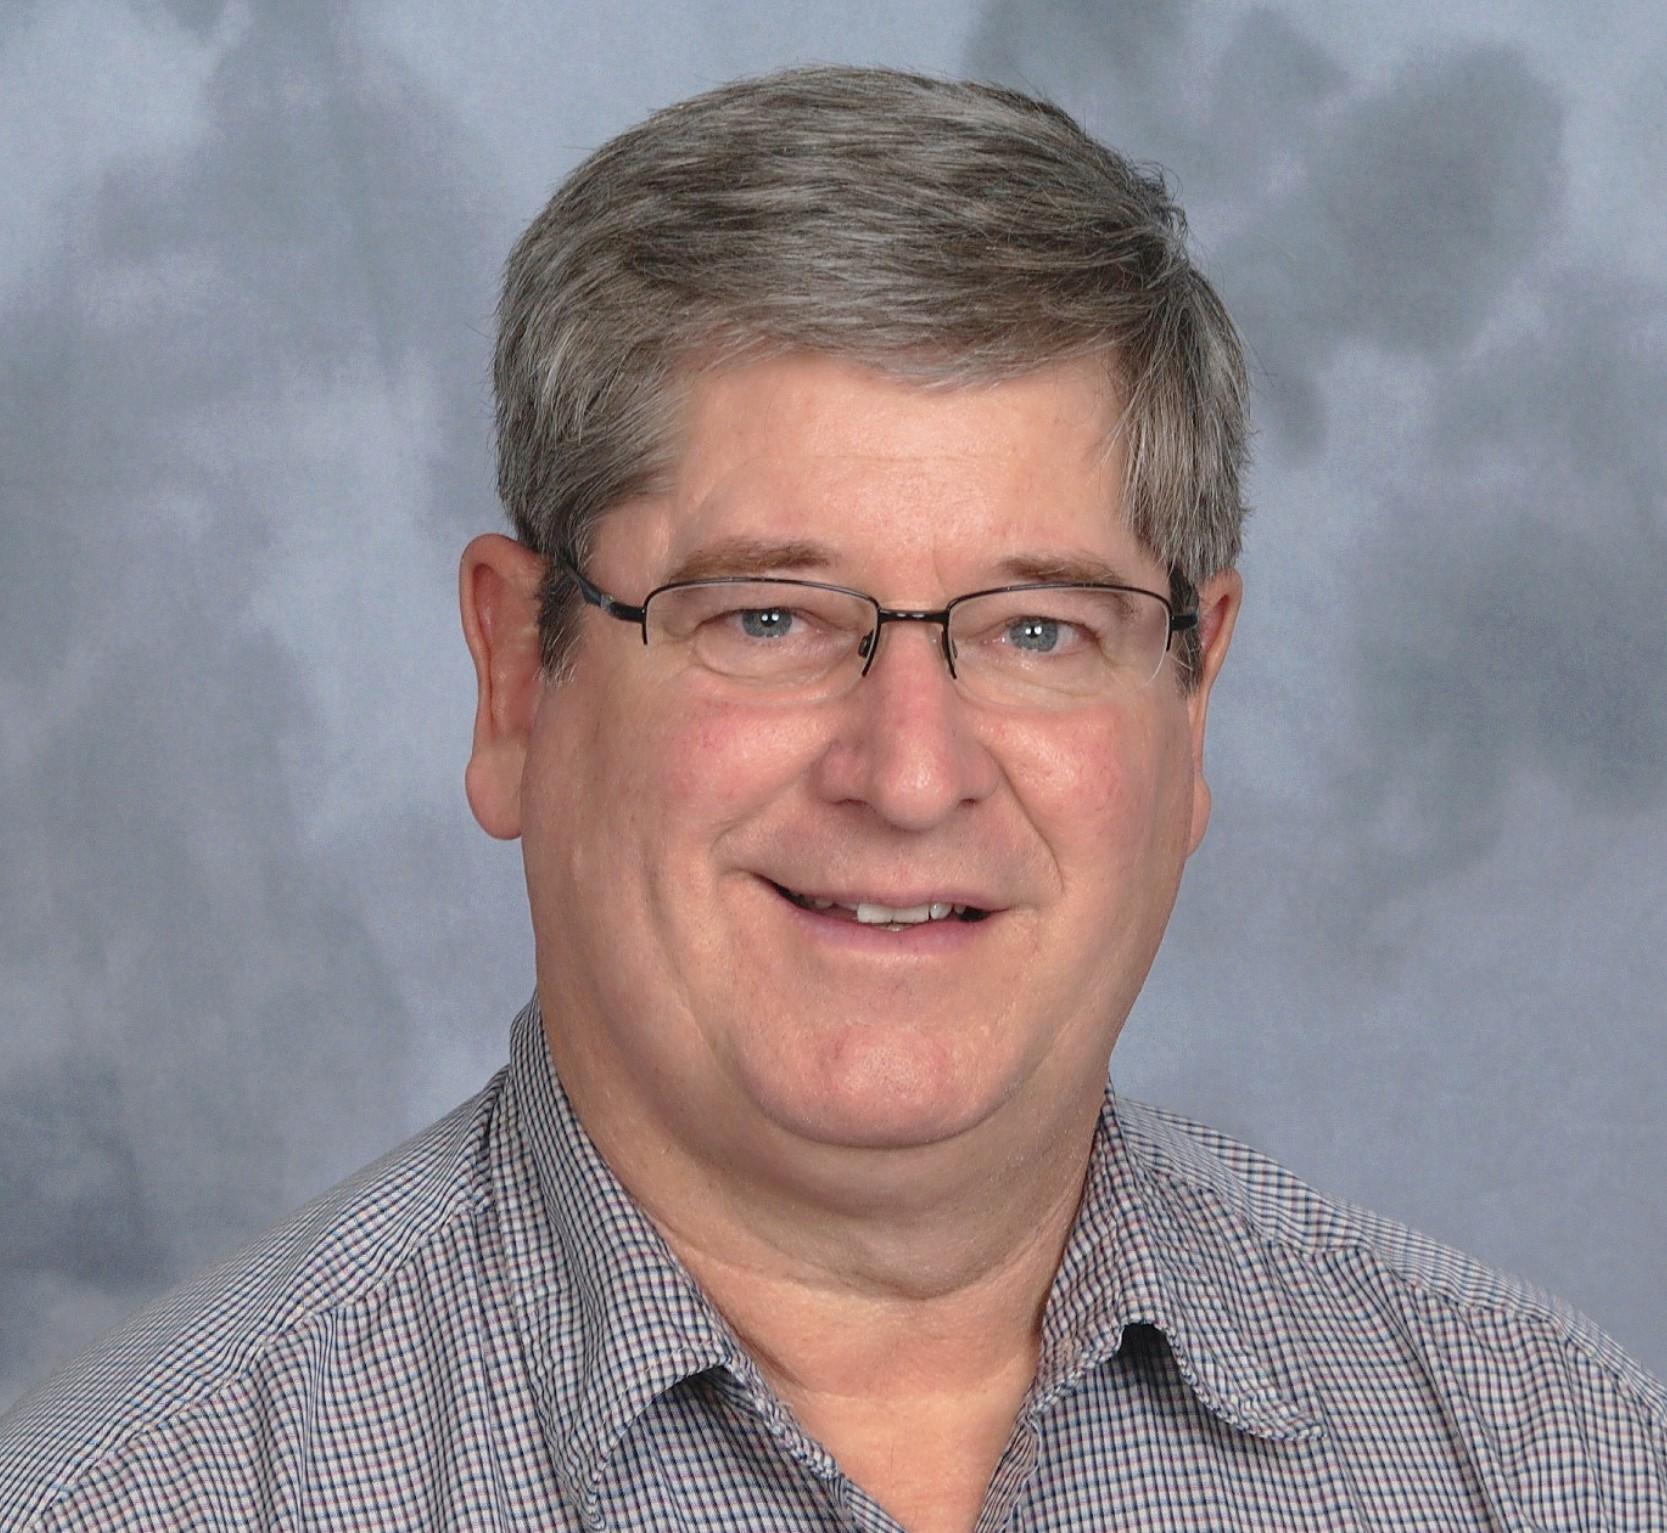 Mark Belshoff - Facility Manager